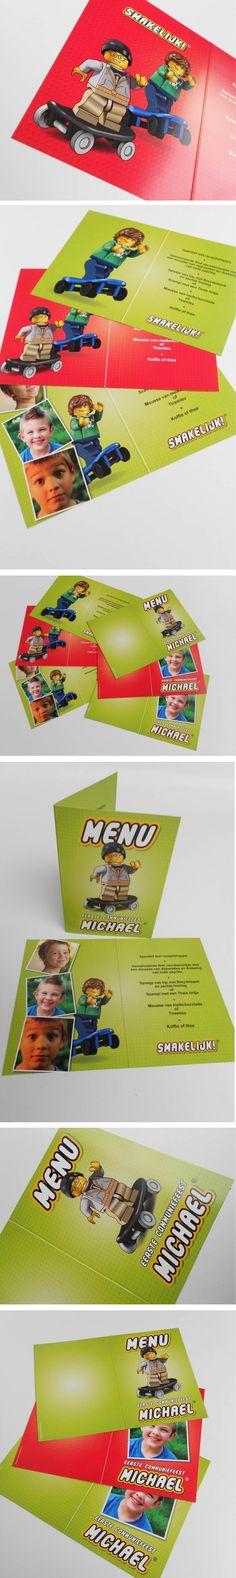 Lego menukaarten 'Skaters' http://www.kaartencollectie.be/nl/lego-menukaart-communiefeest-skaters-1199.htm